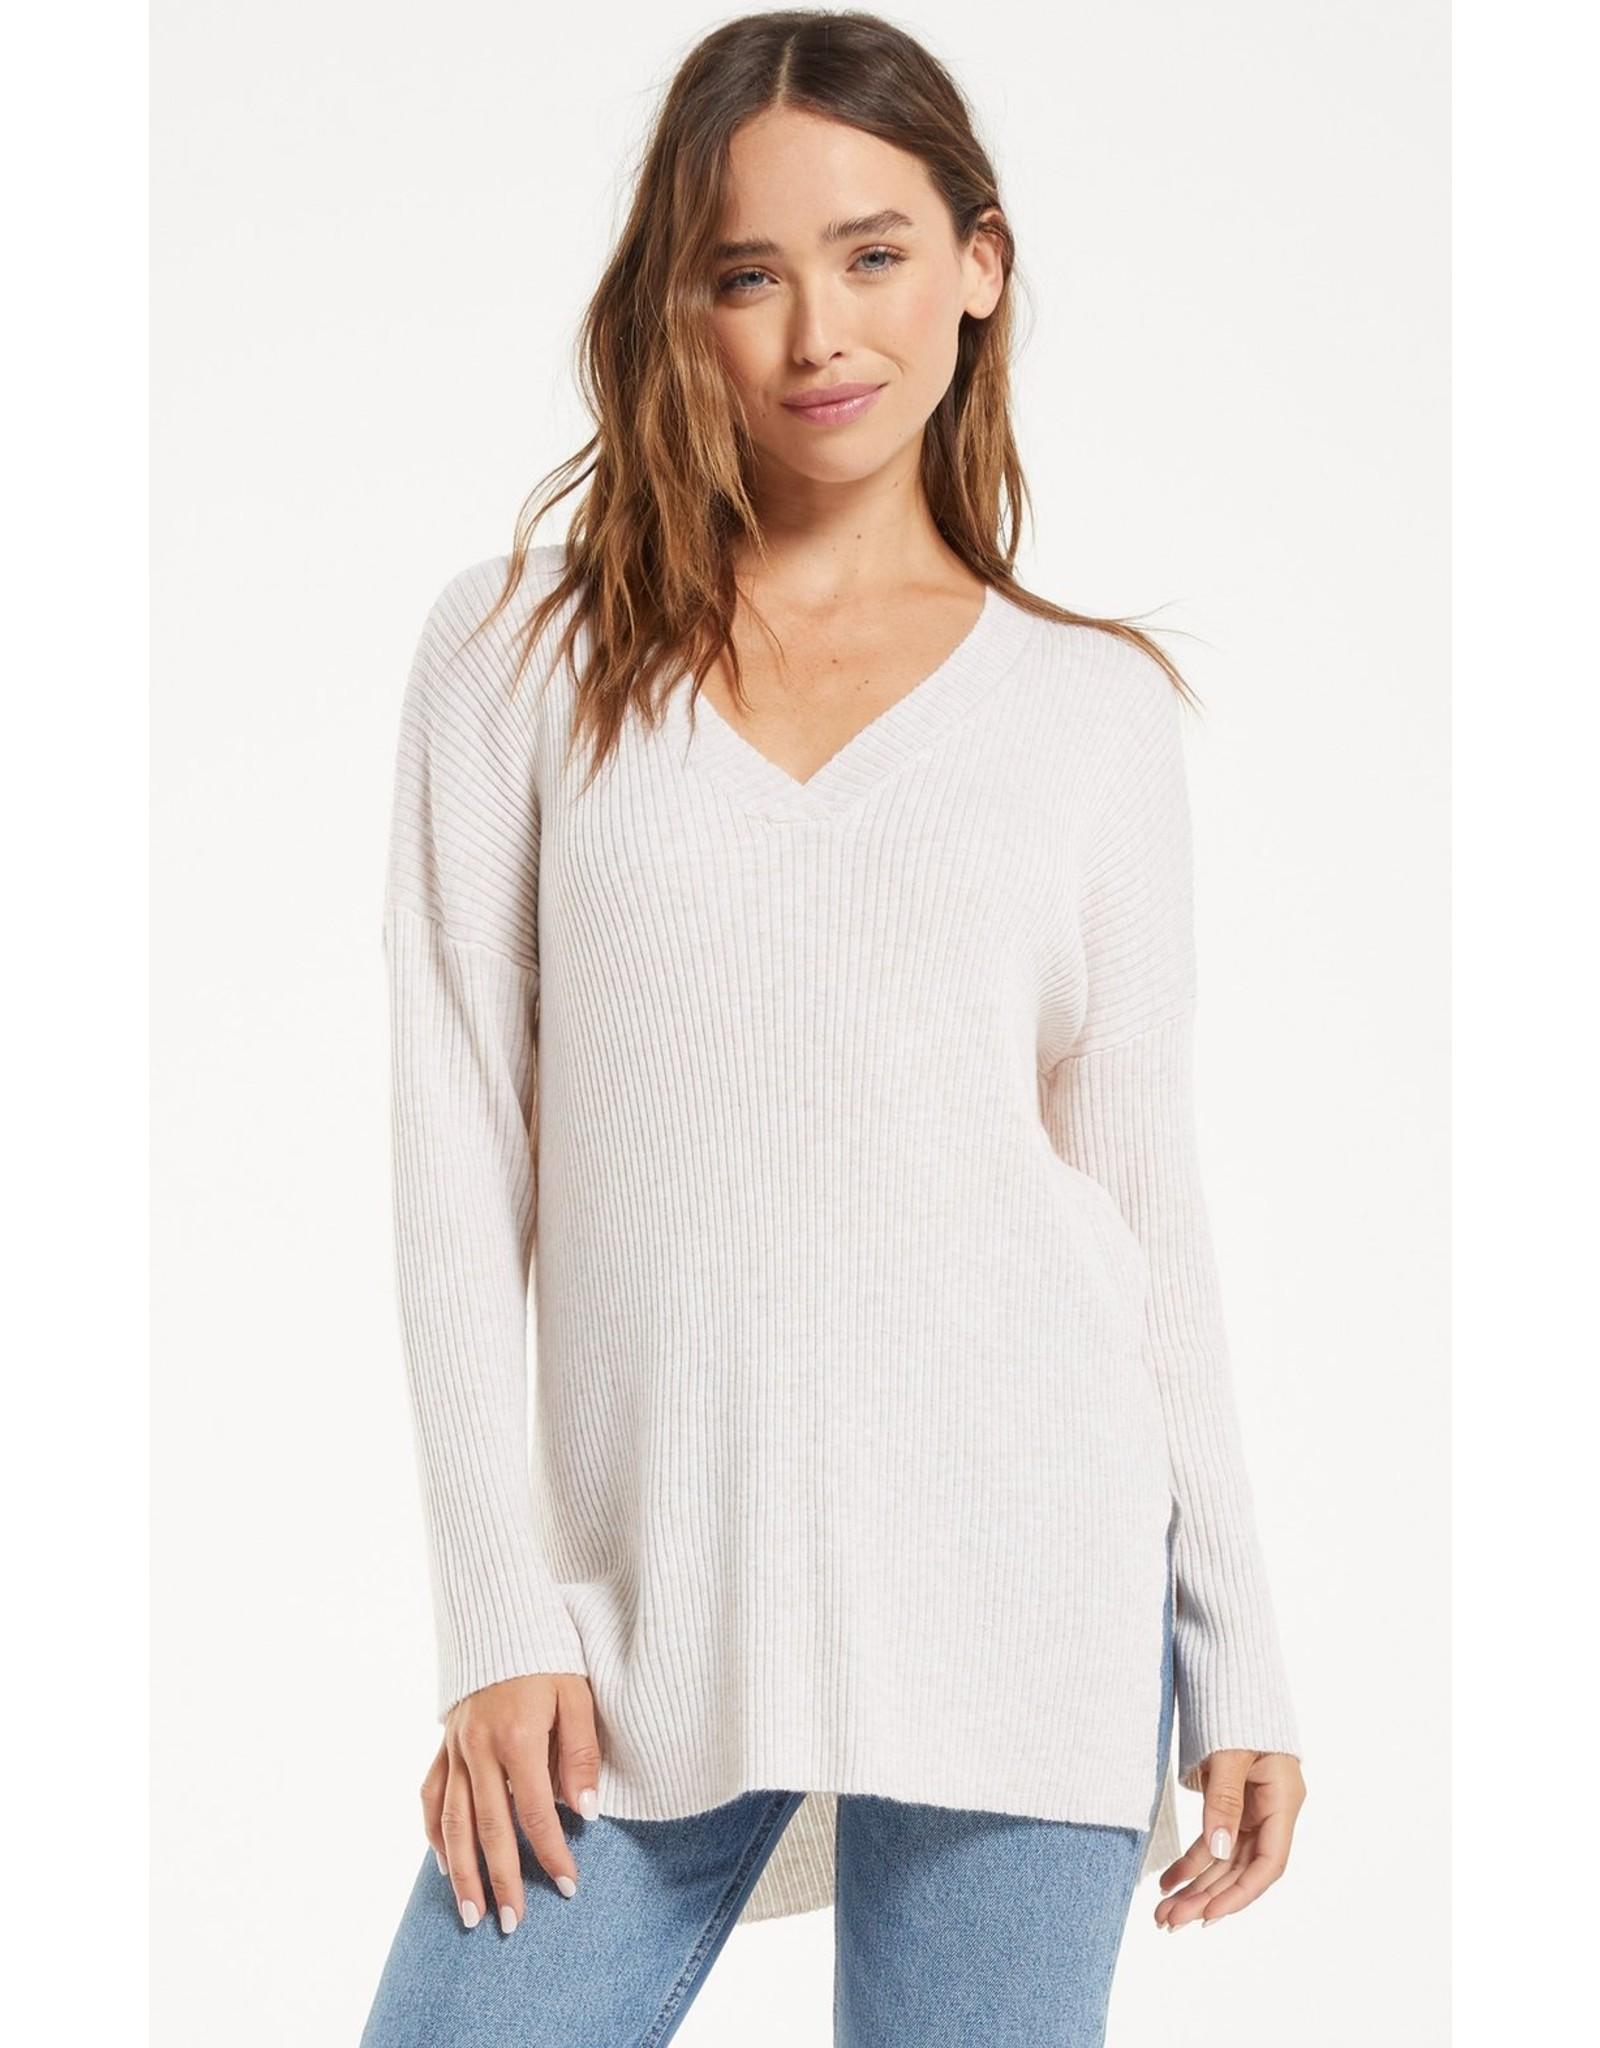 Z Supply - Avalon Sweater Top